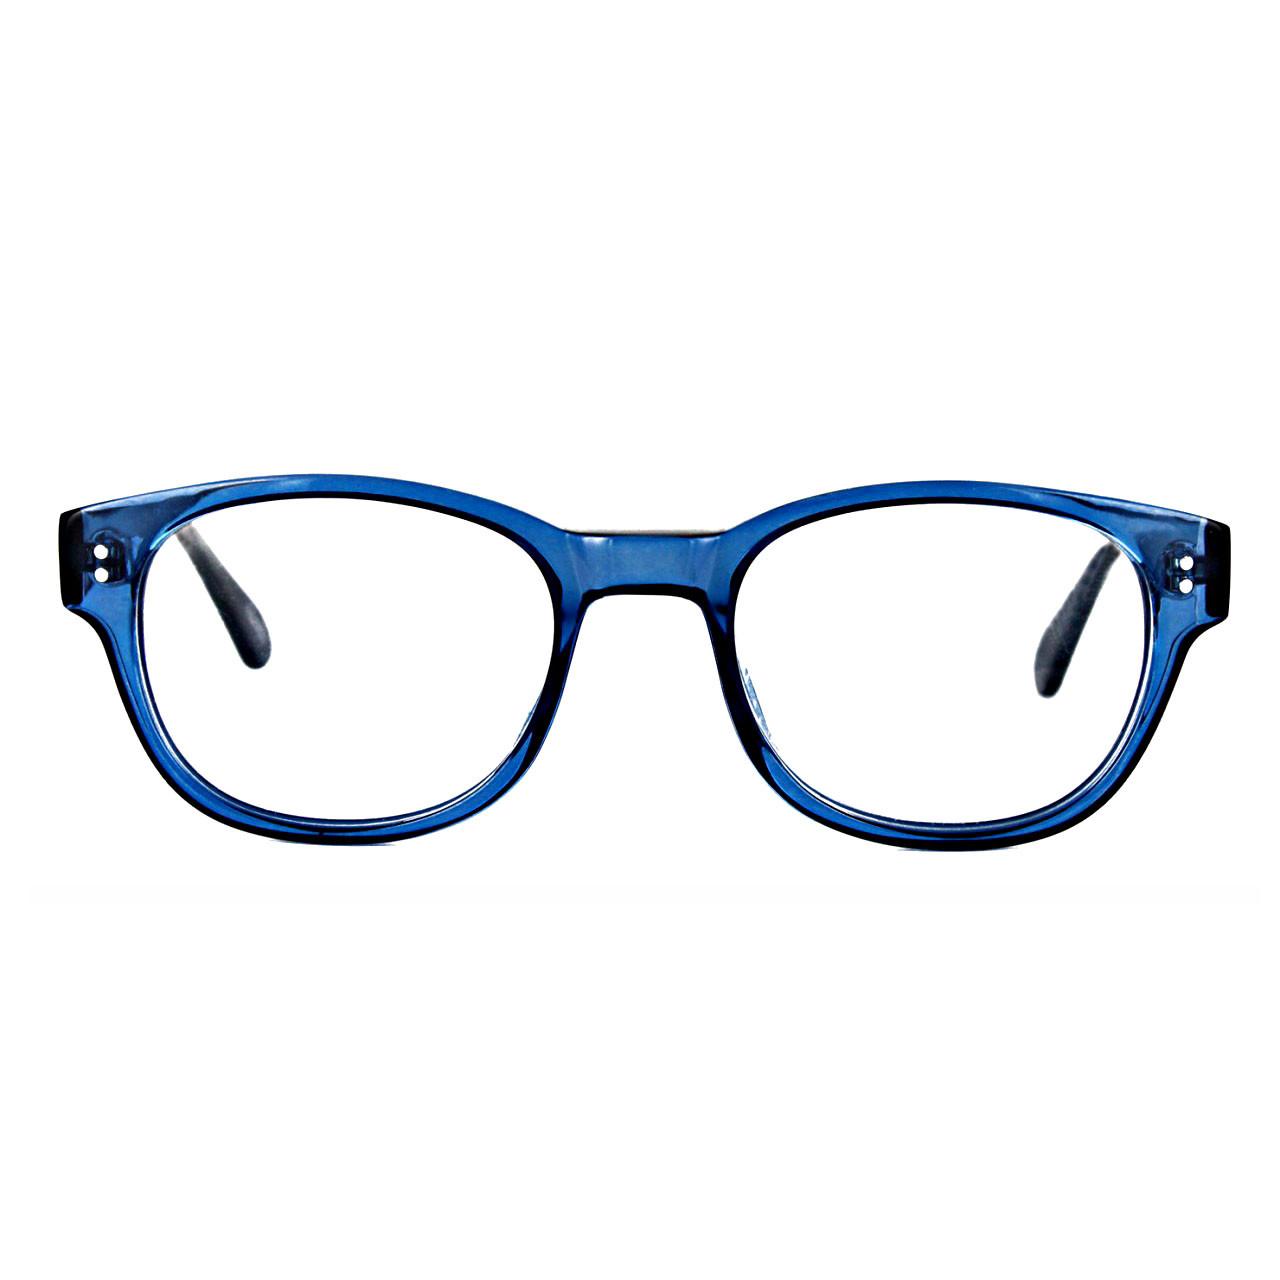 GEEK Eyewear GEEK 124